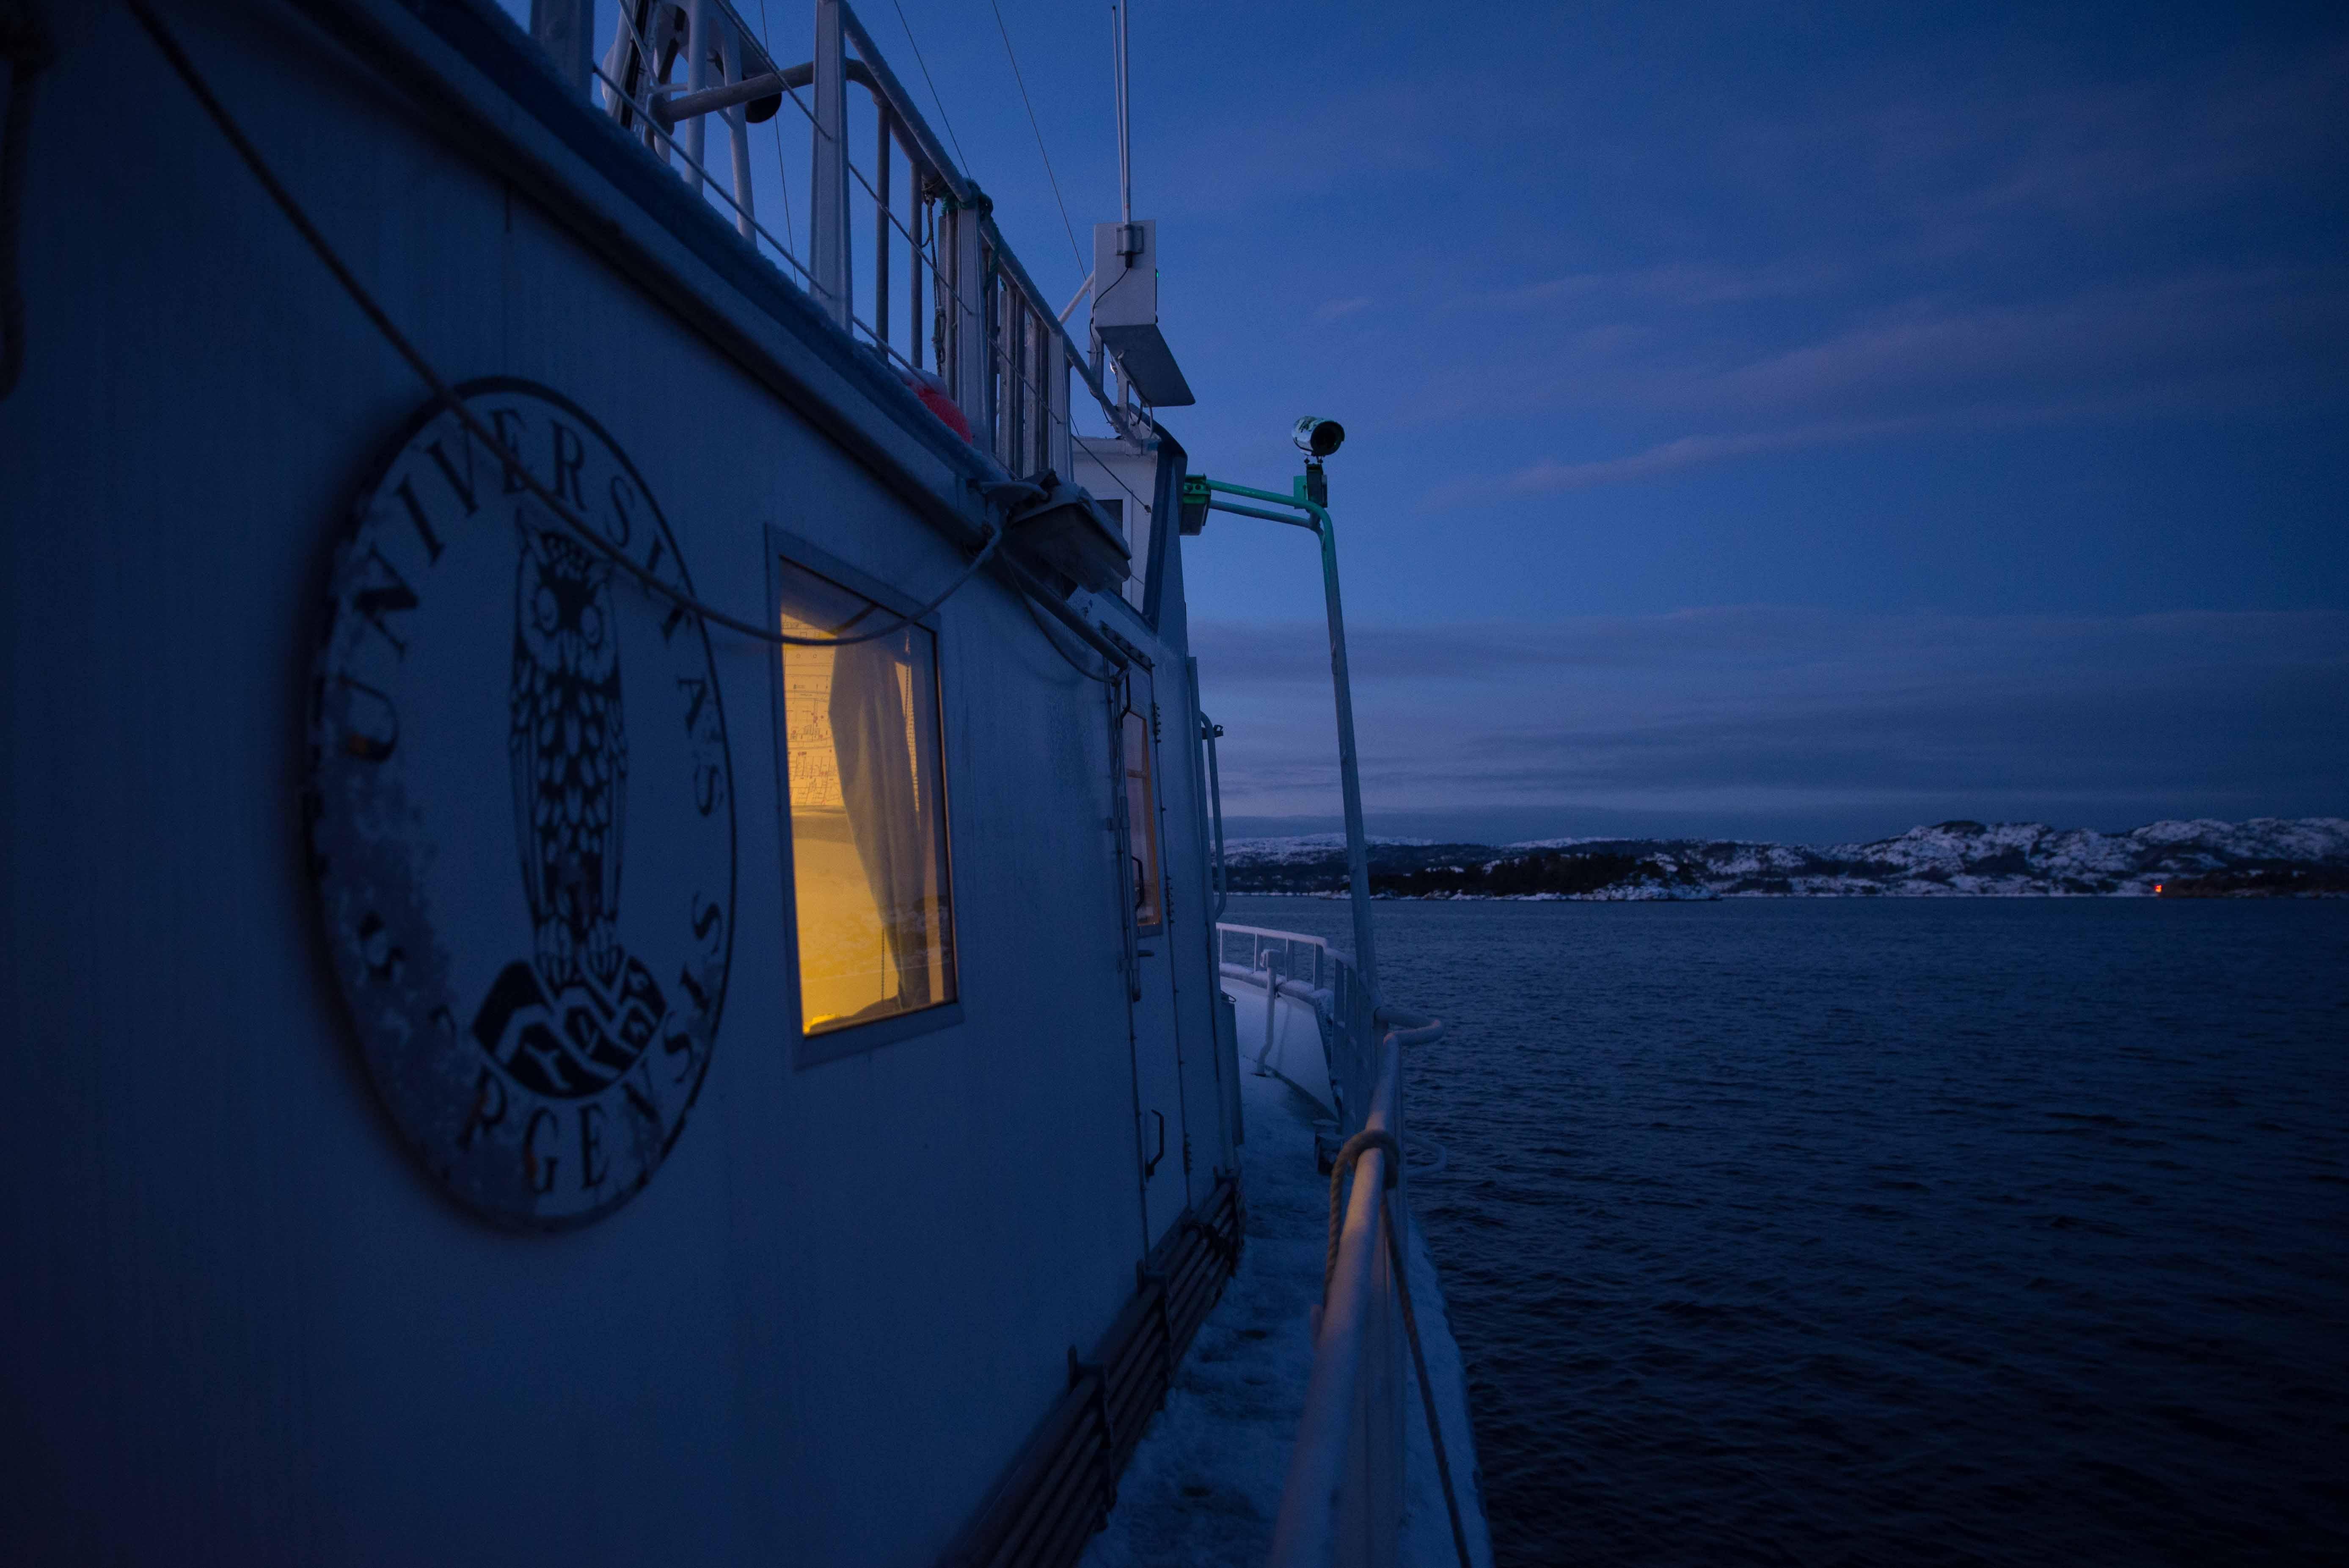 Morgenstemning på kald båt. Foto: AHS Tandberg